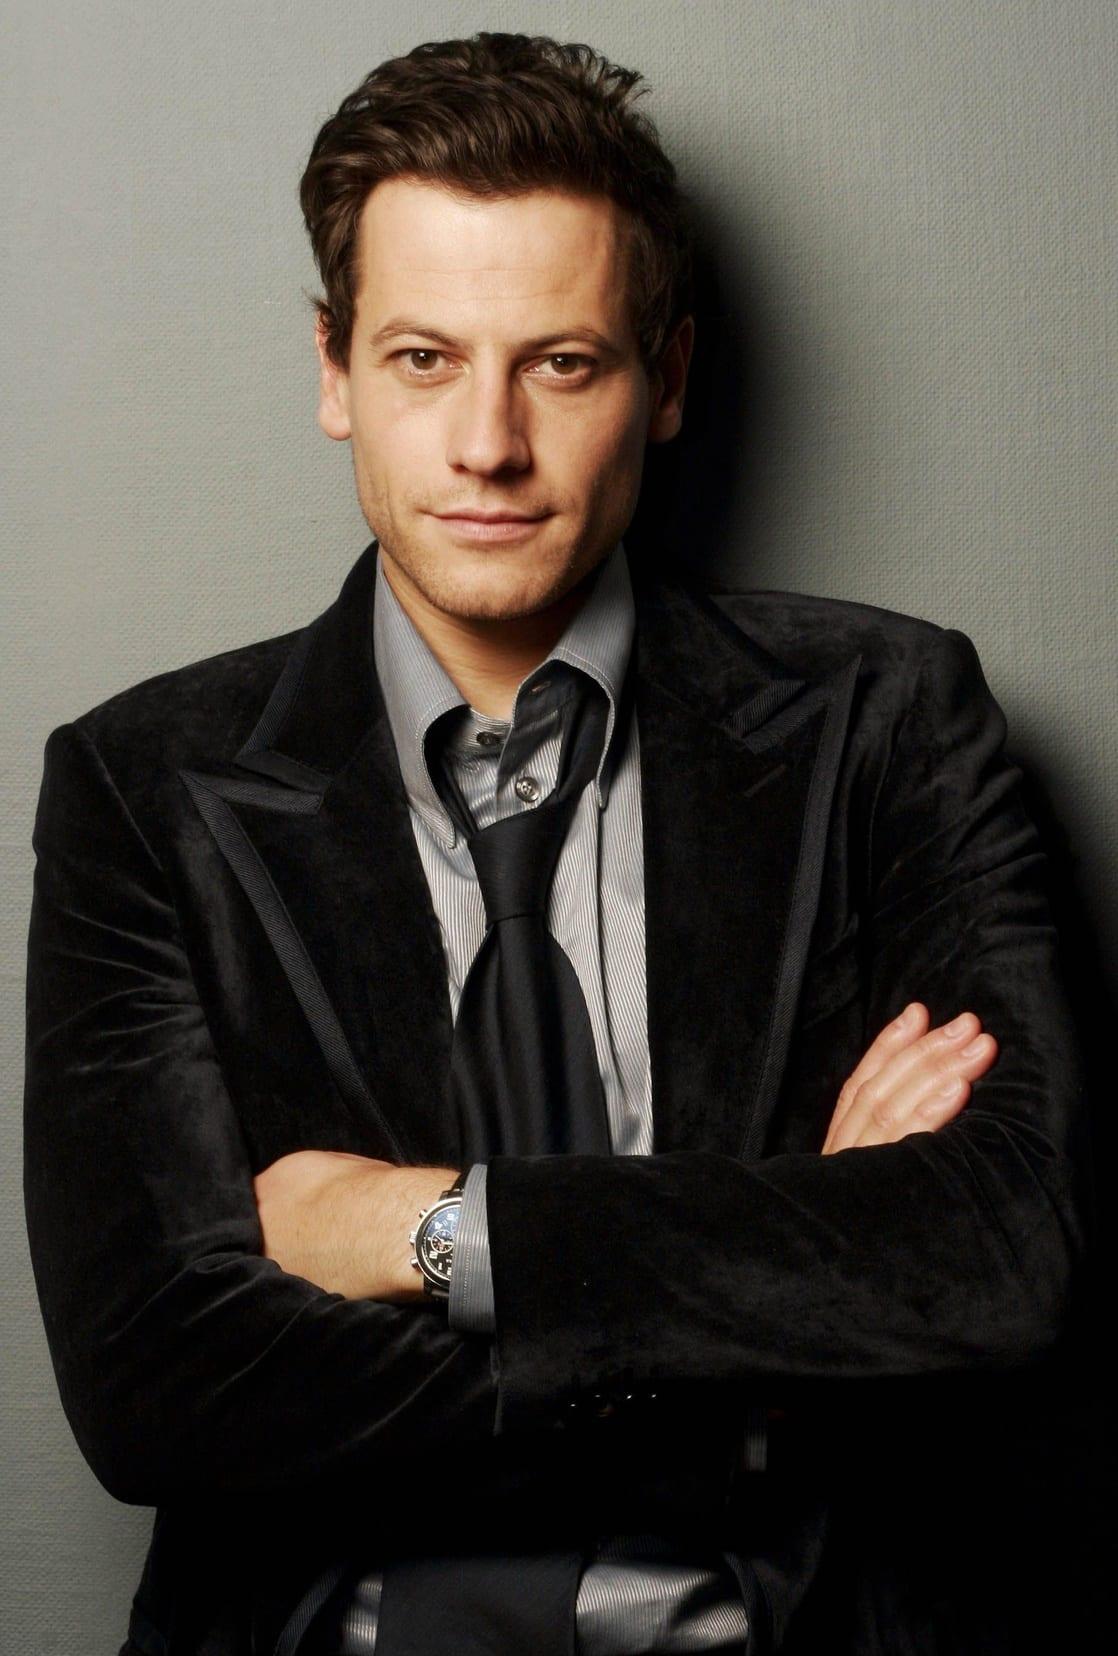 picture Ioan Gruffudd (born 1973)